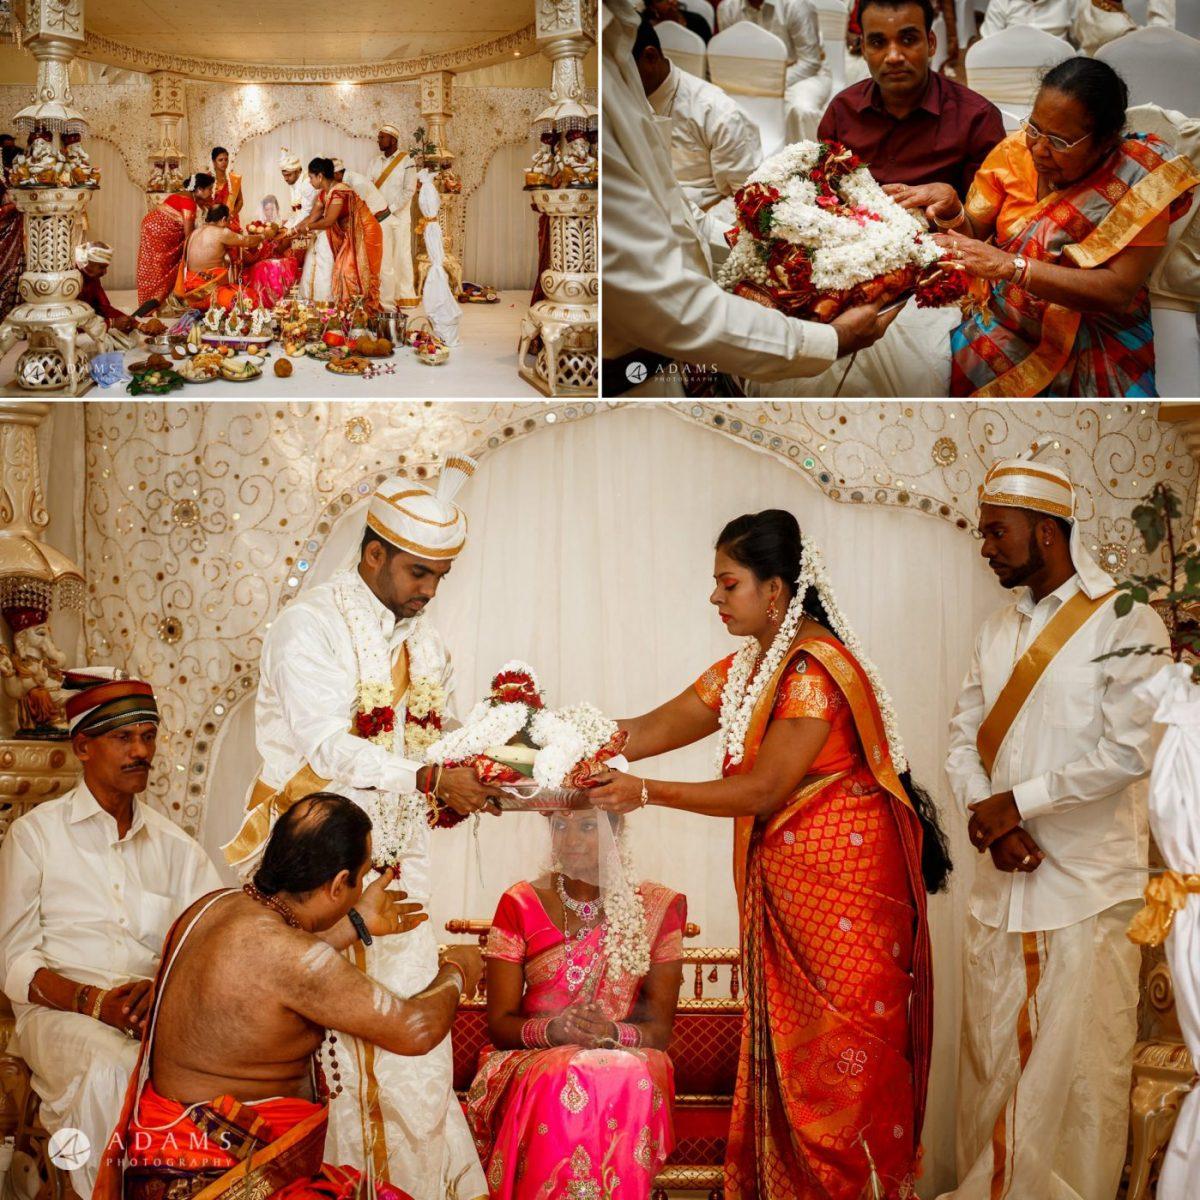 sara and anojan during the wedding ceremony